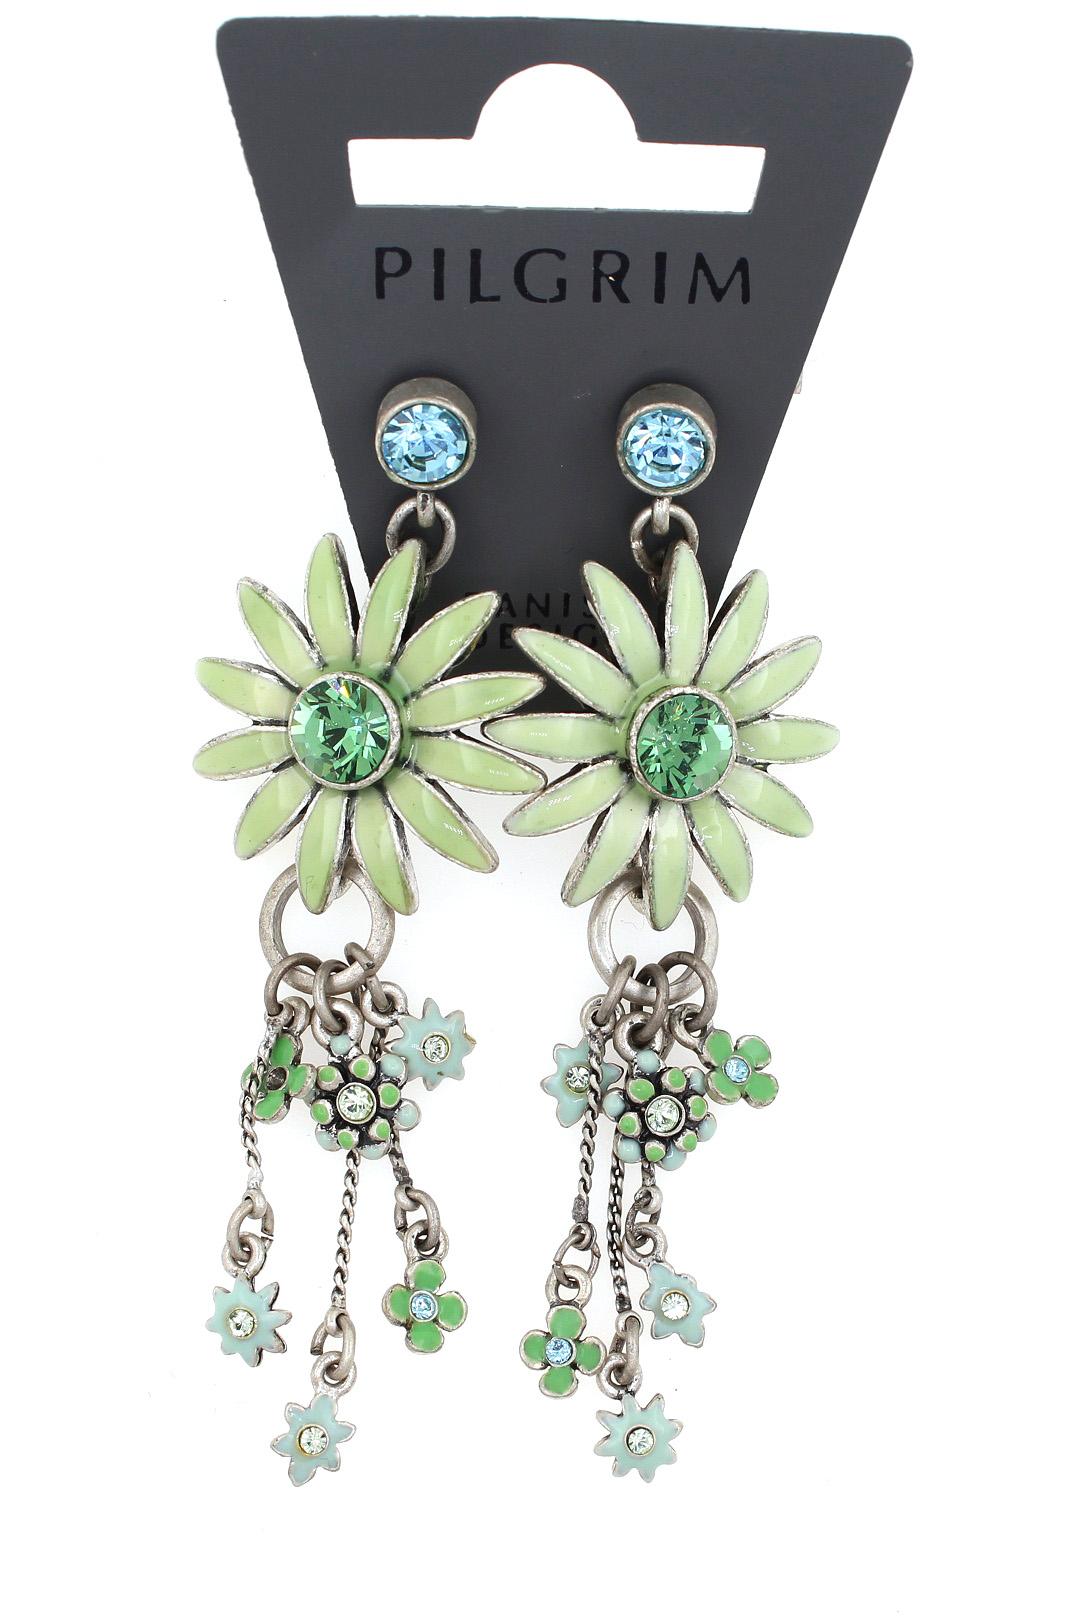 PILGRIM - Daisy - Elaborate Earrings - Oxidised Silver Plate/Green BNWT